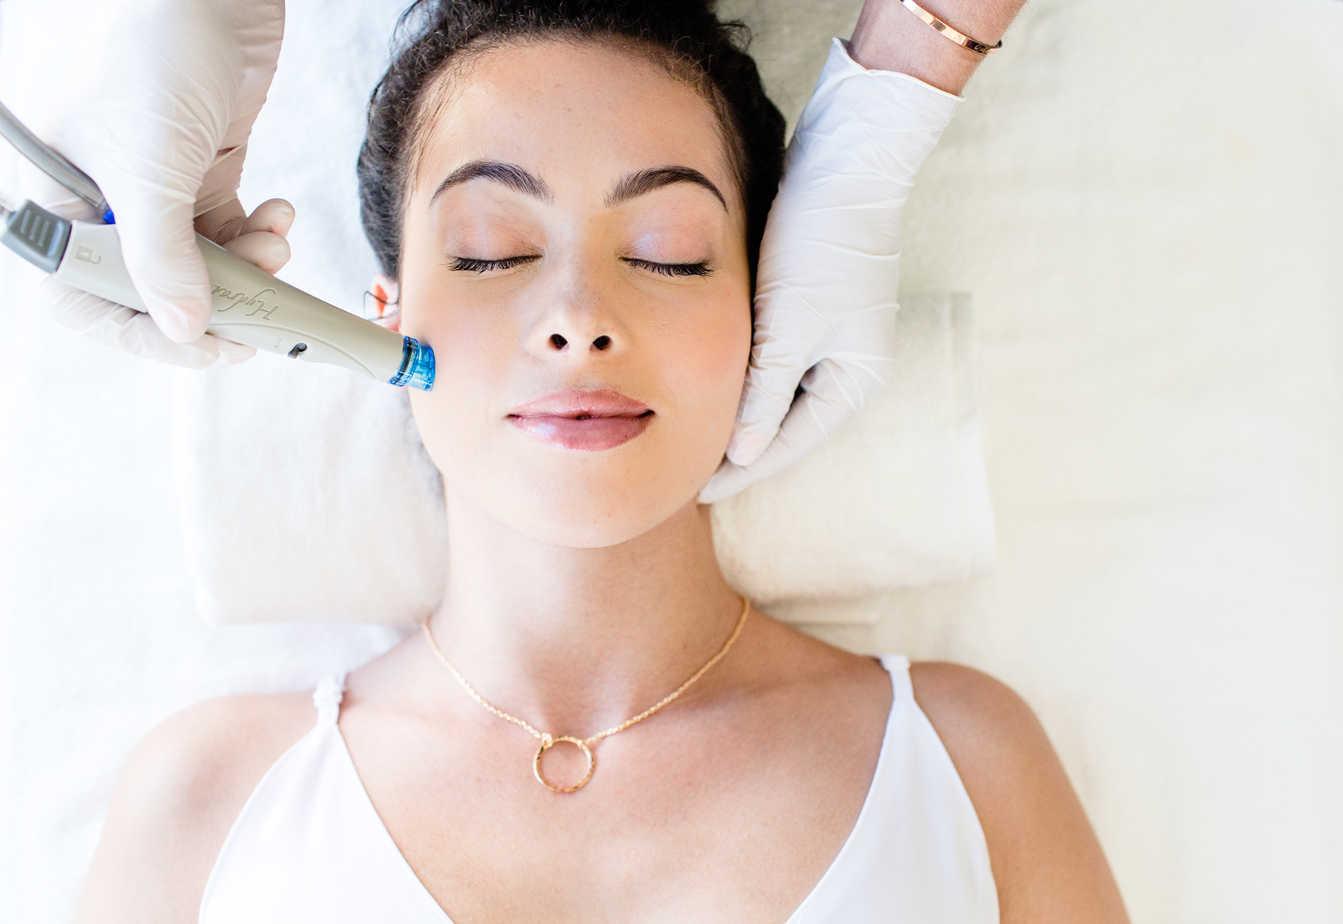 LaVida Massage and Skincare, Skin Care, Facials, Massage, Hydrafacial